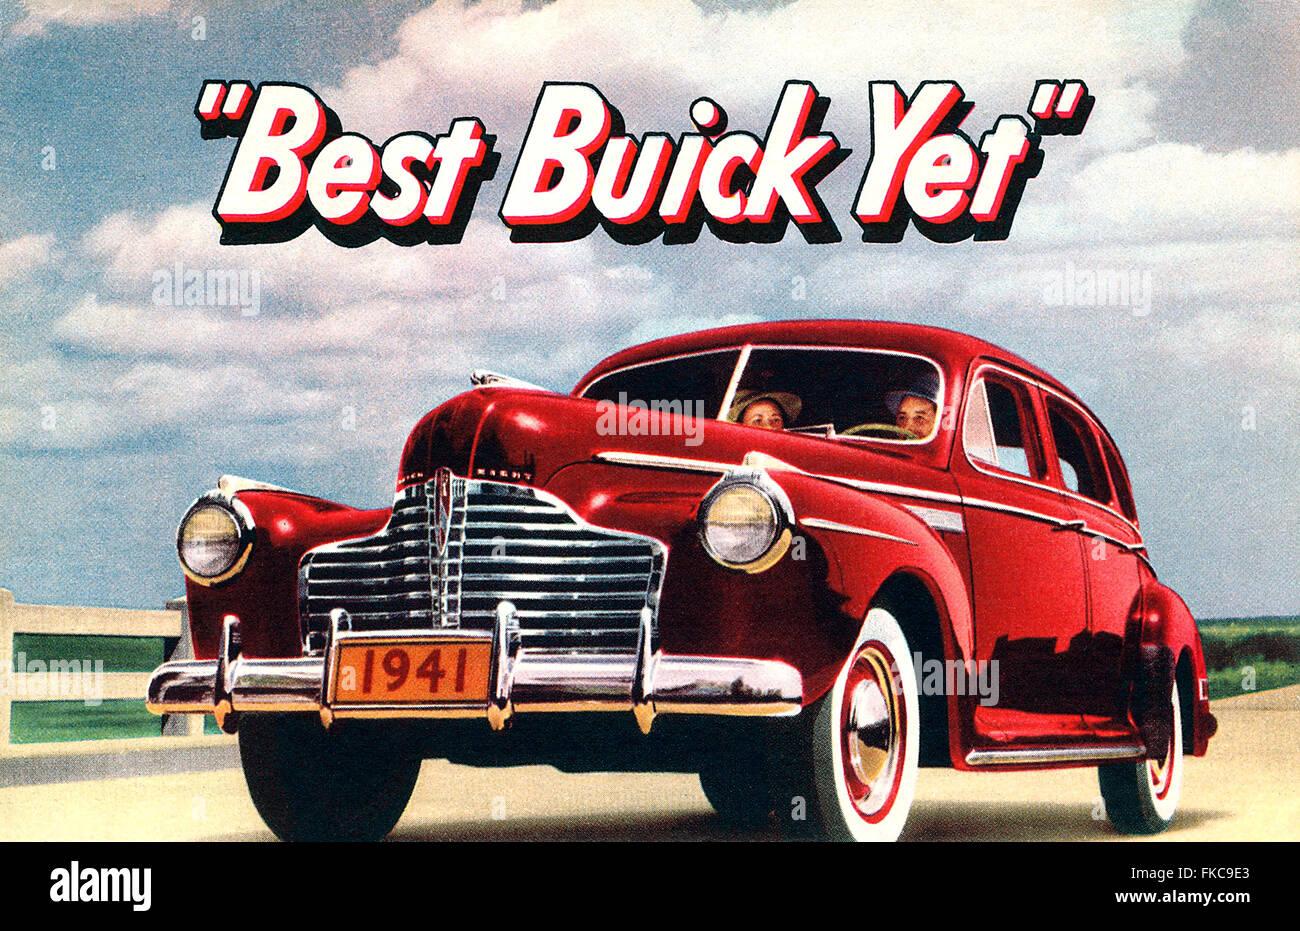 USA Buick Magazine Advert - Stock Image